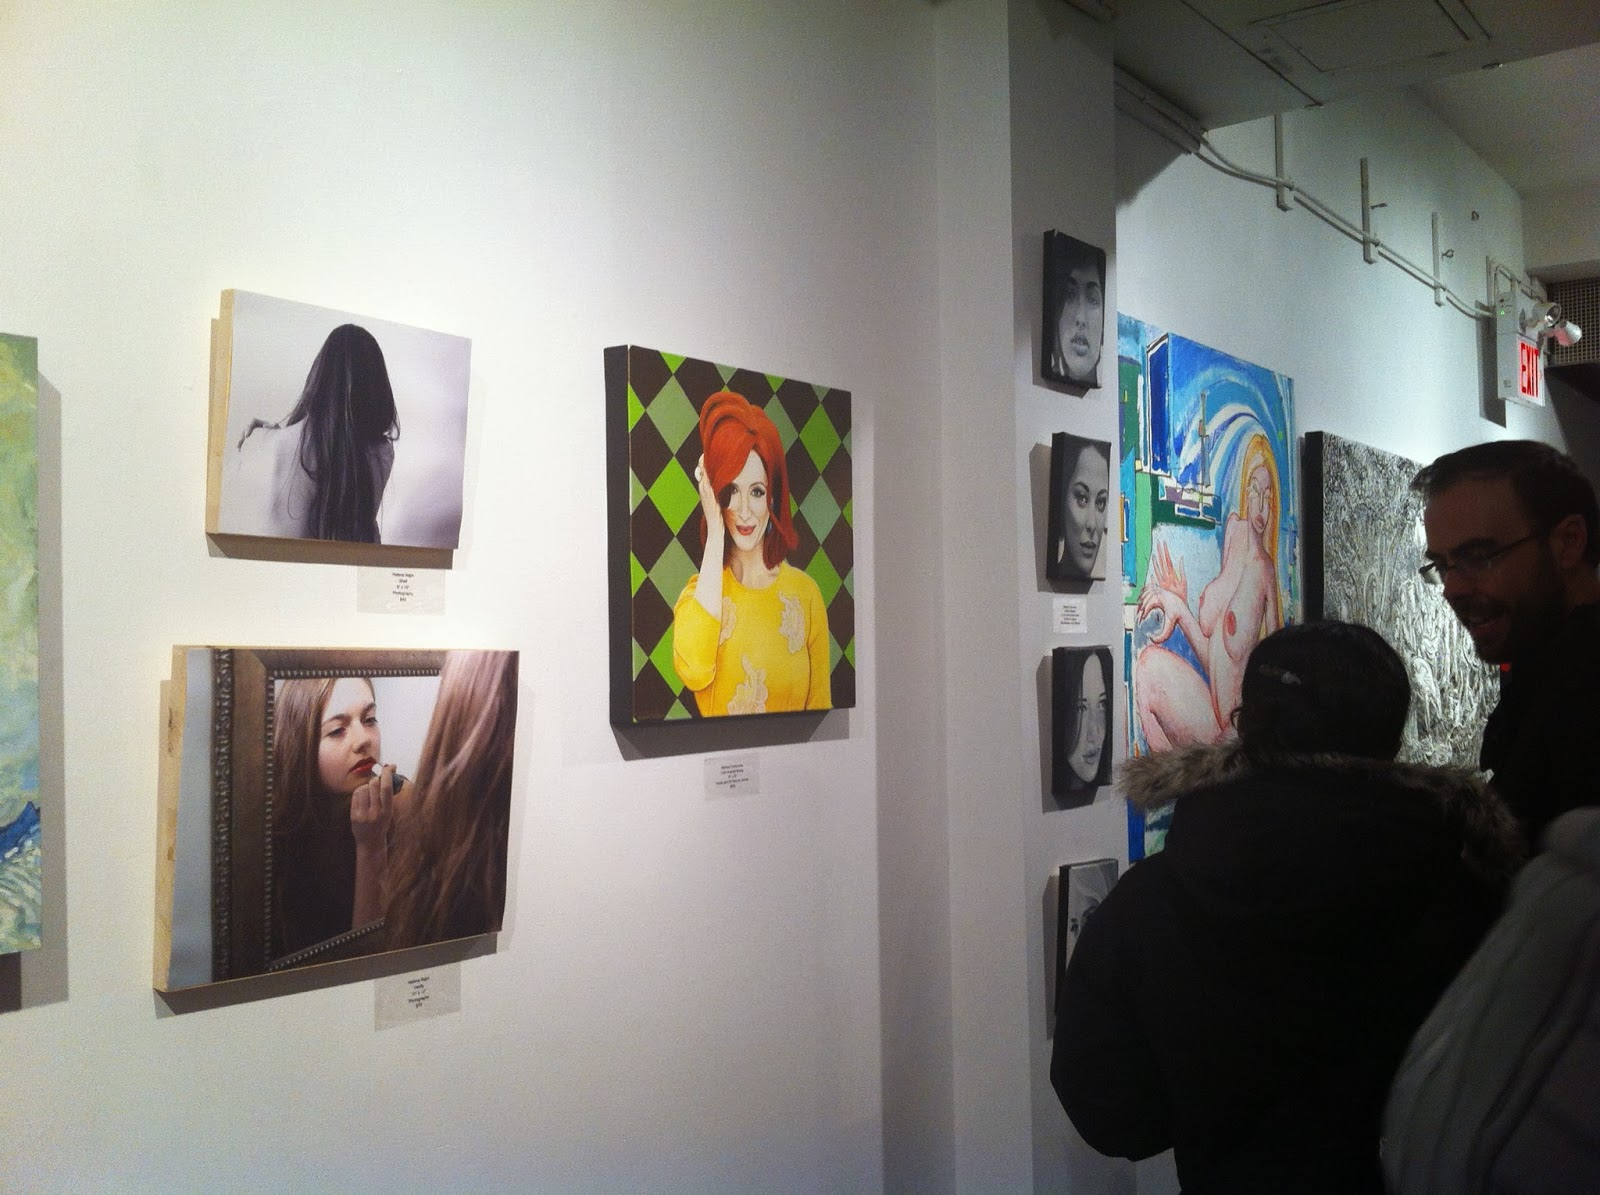 moniker gallery, toronto art show, spitting image, portrait art, portrait artist, malinda prudhomme, toronto artist, michelle moniker, figurative art, art gallery, moniker, malinda prudhomme